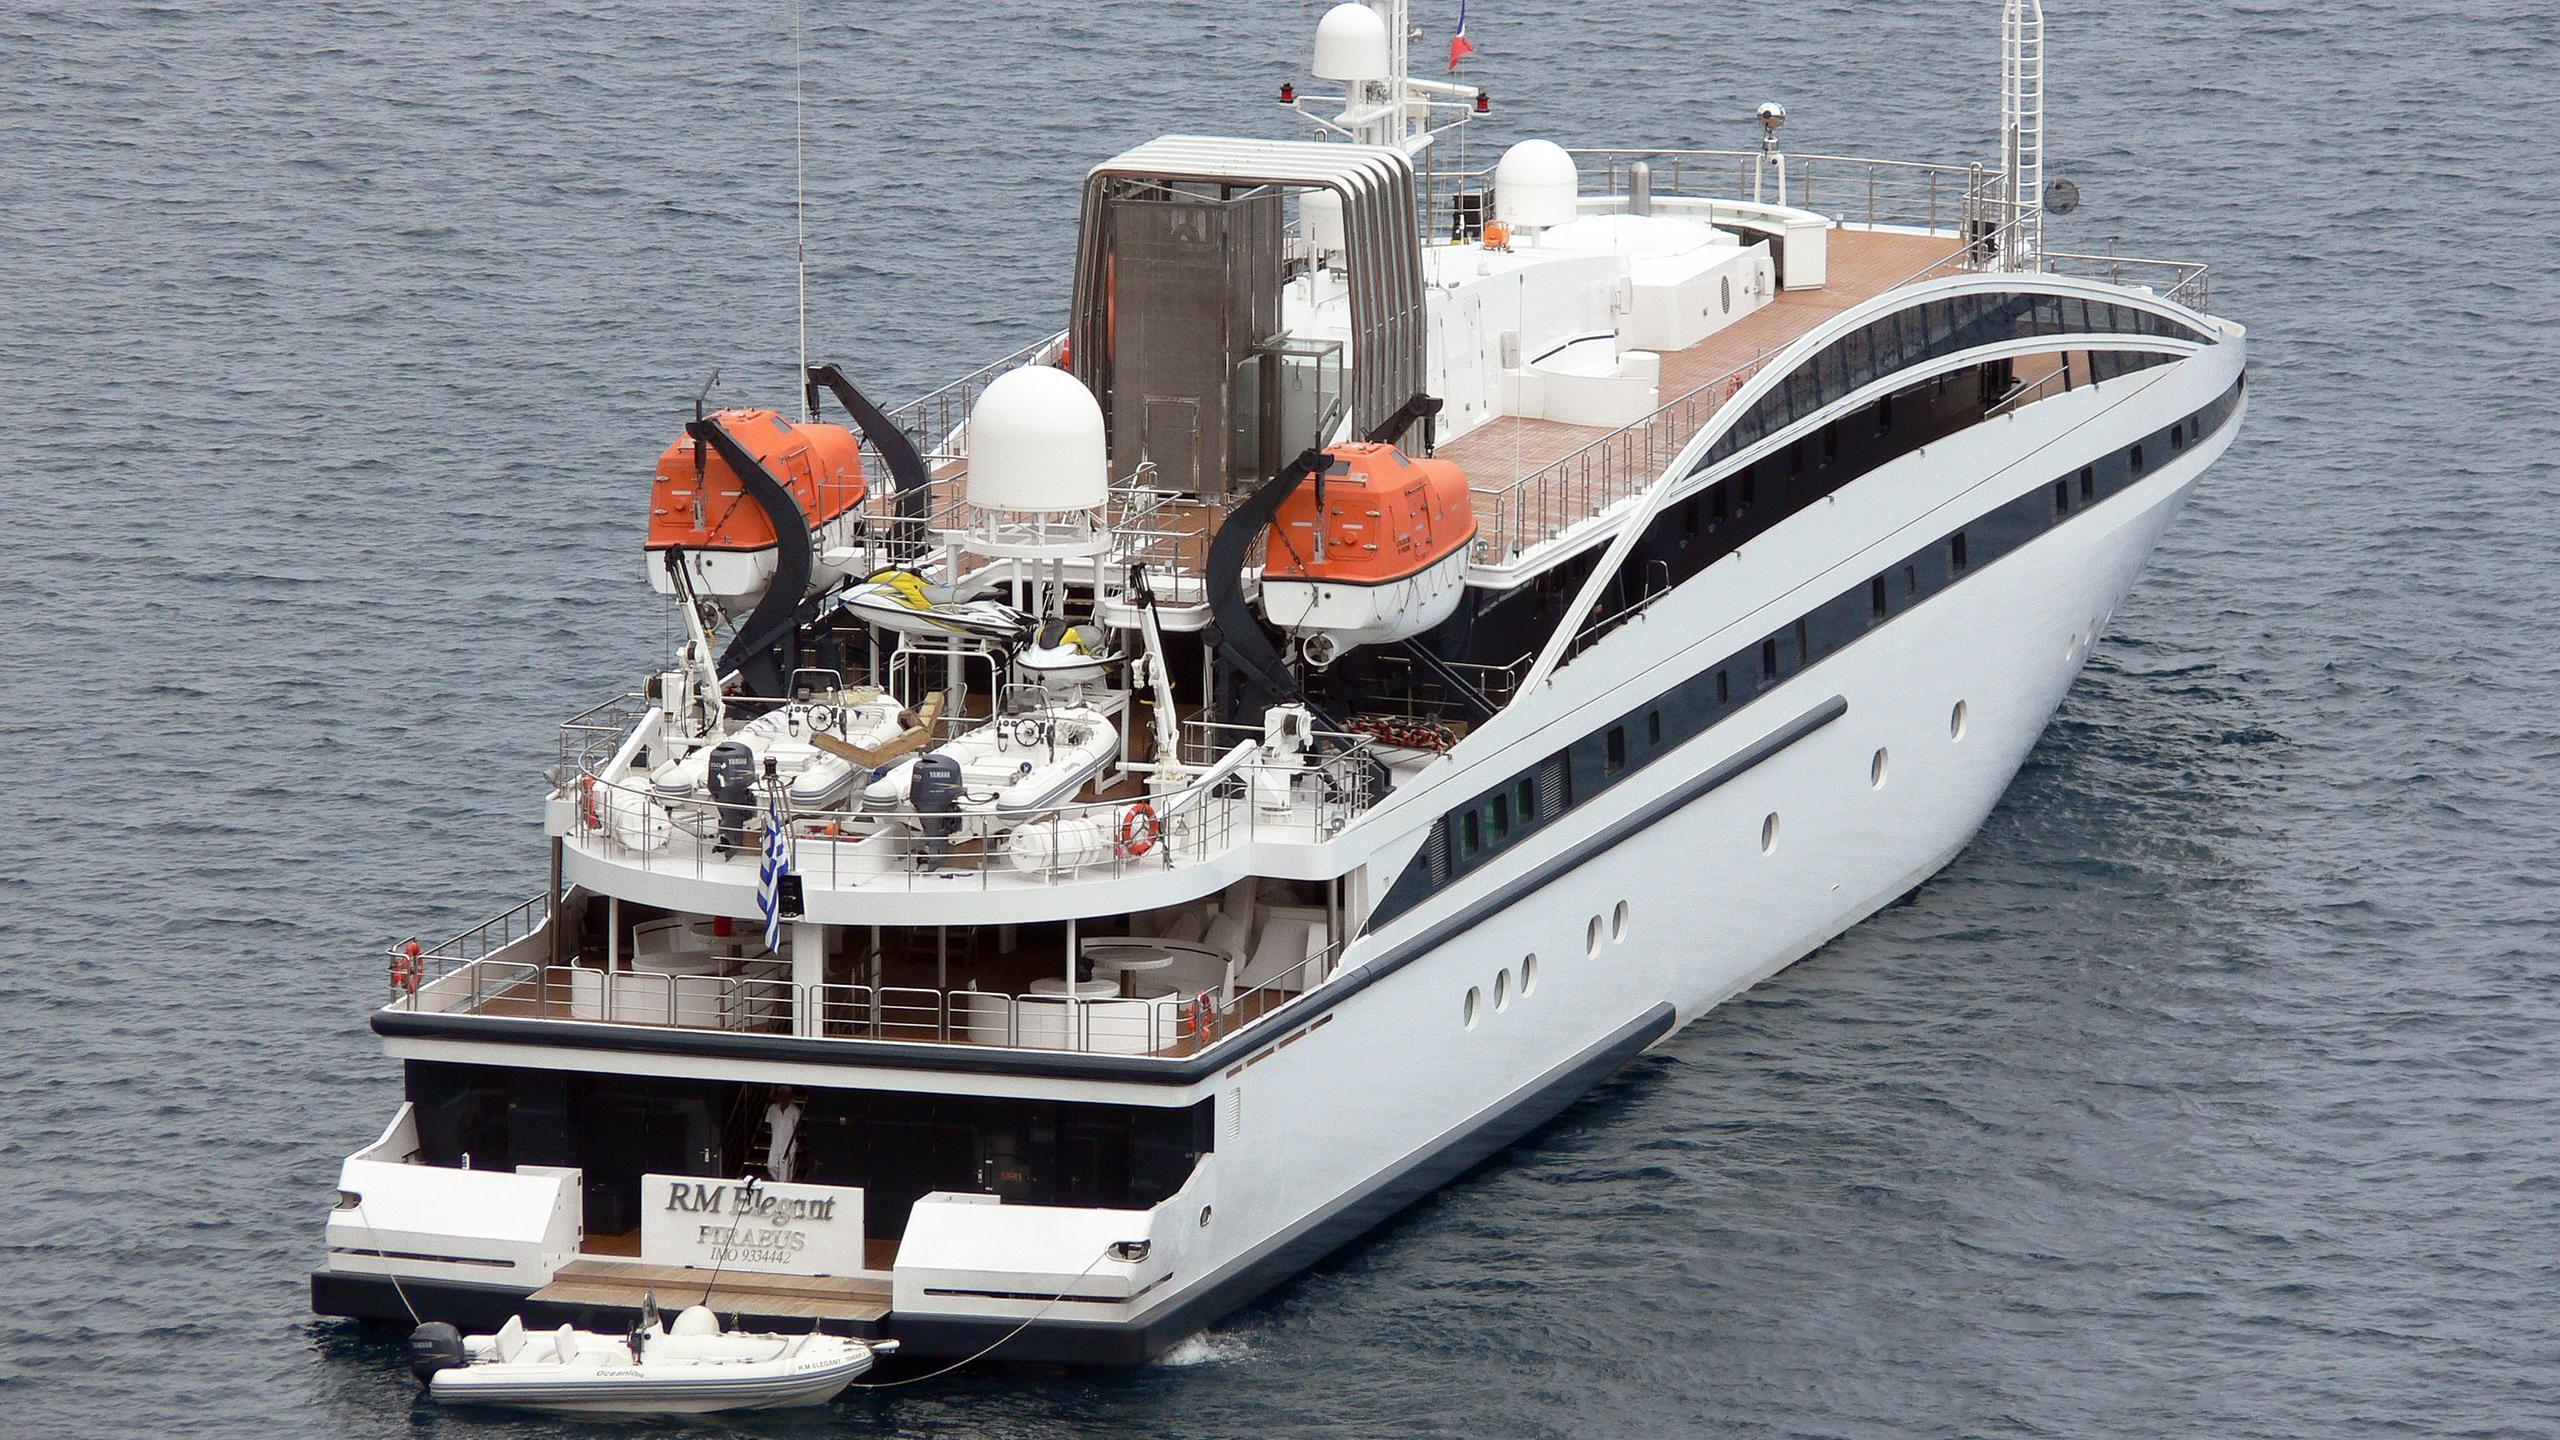 elegant-007-rm-elegant--motor-yacht-lamda-2005-72m-aerial-stern